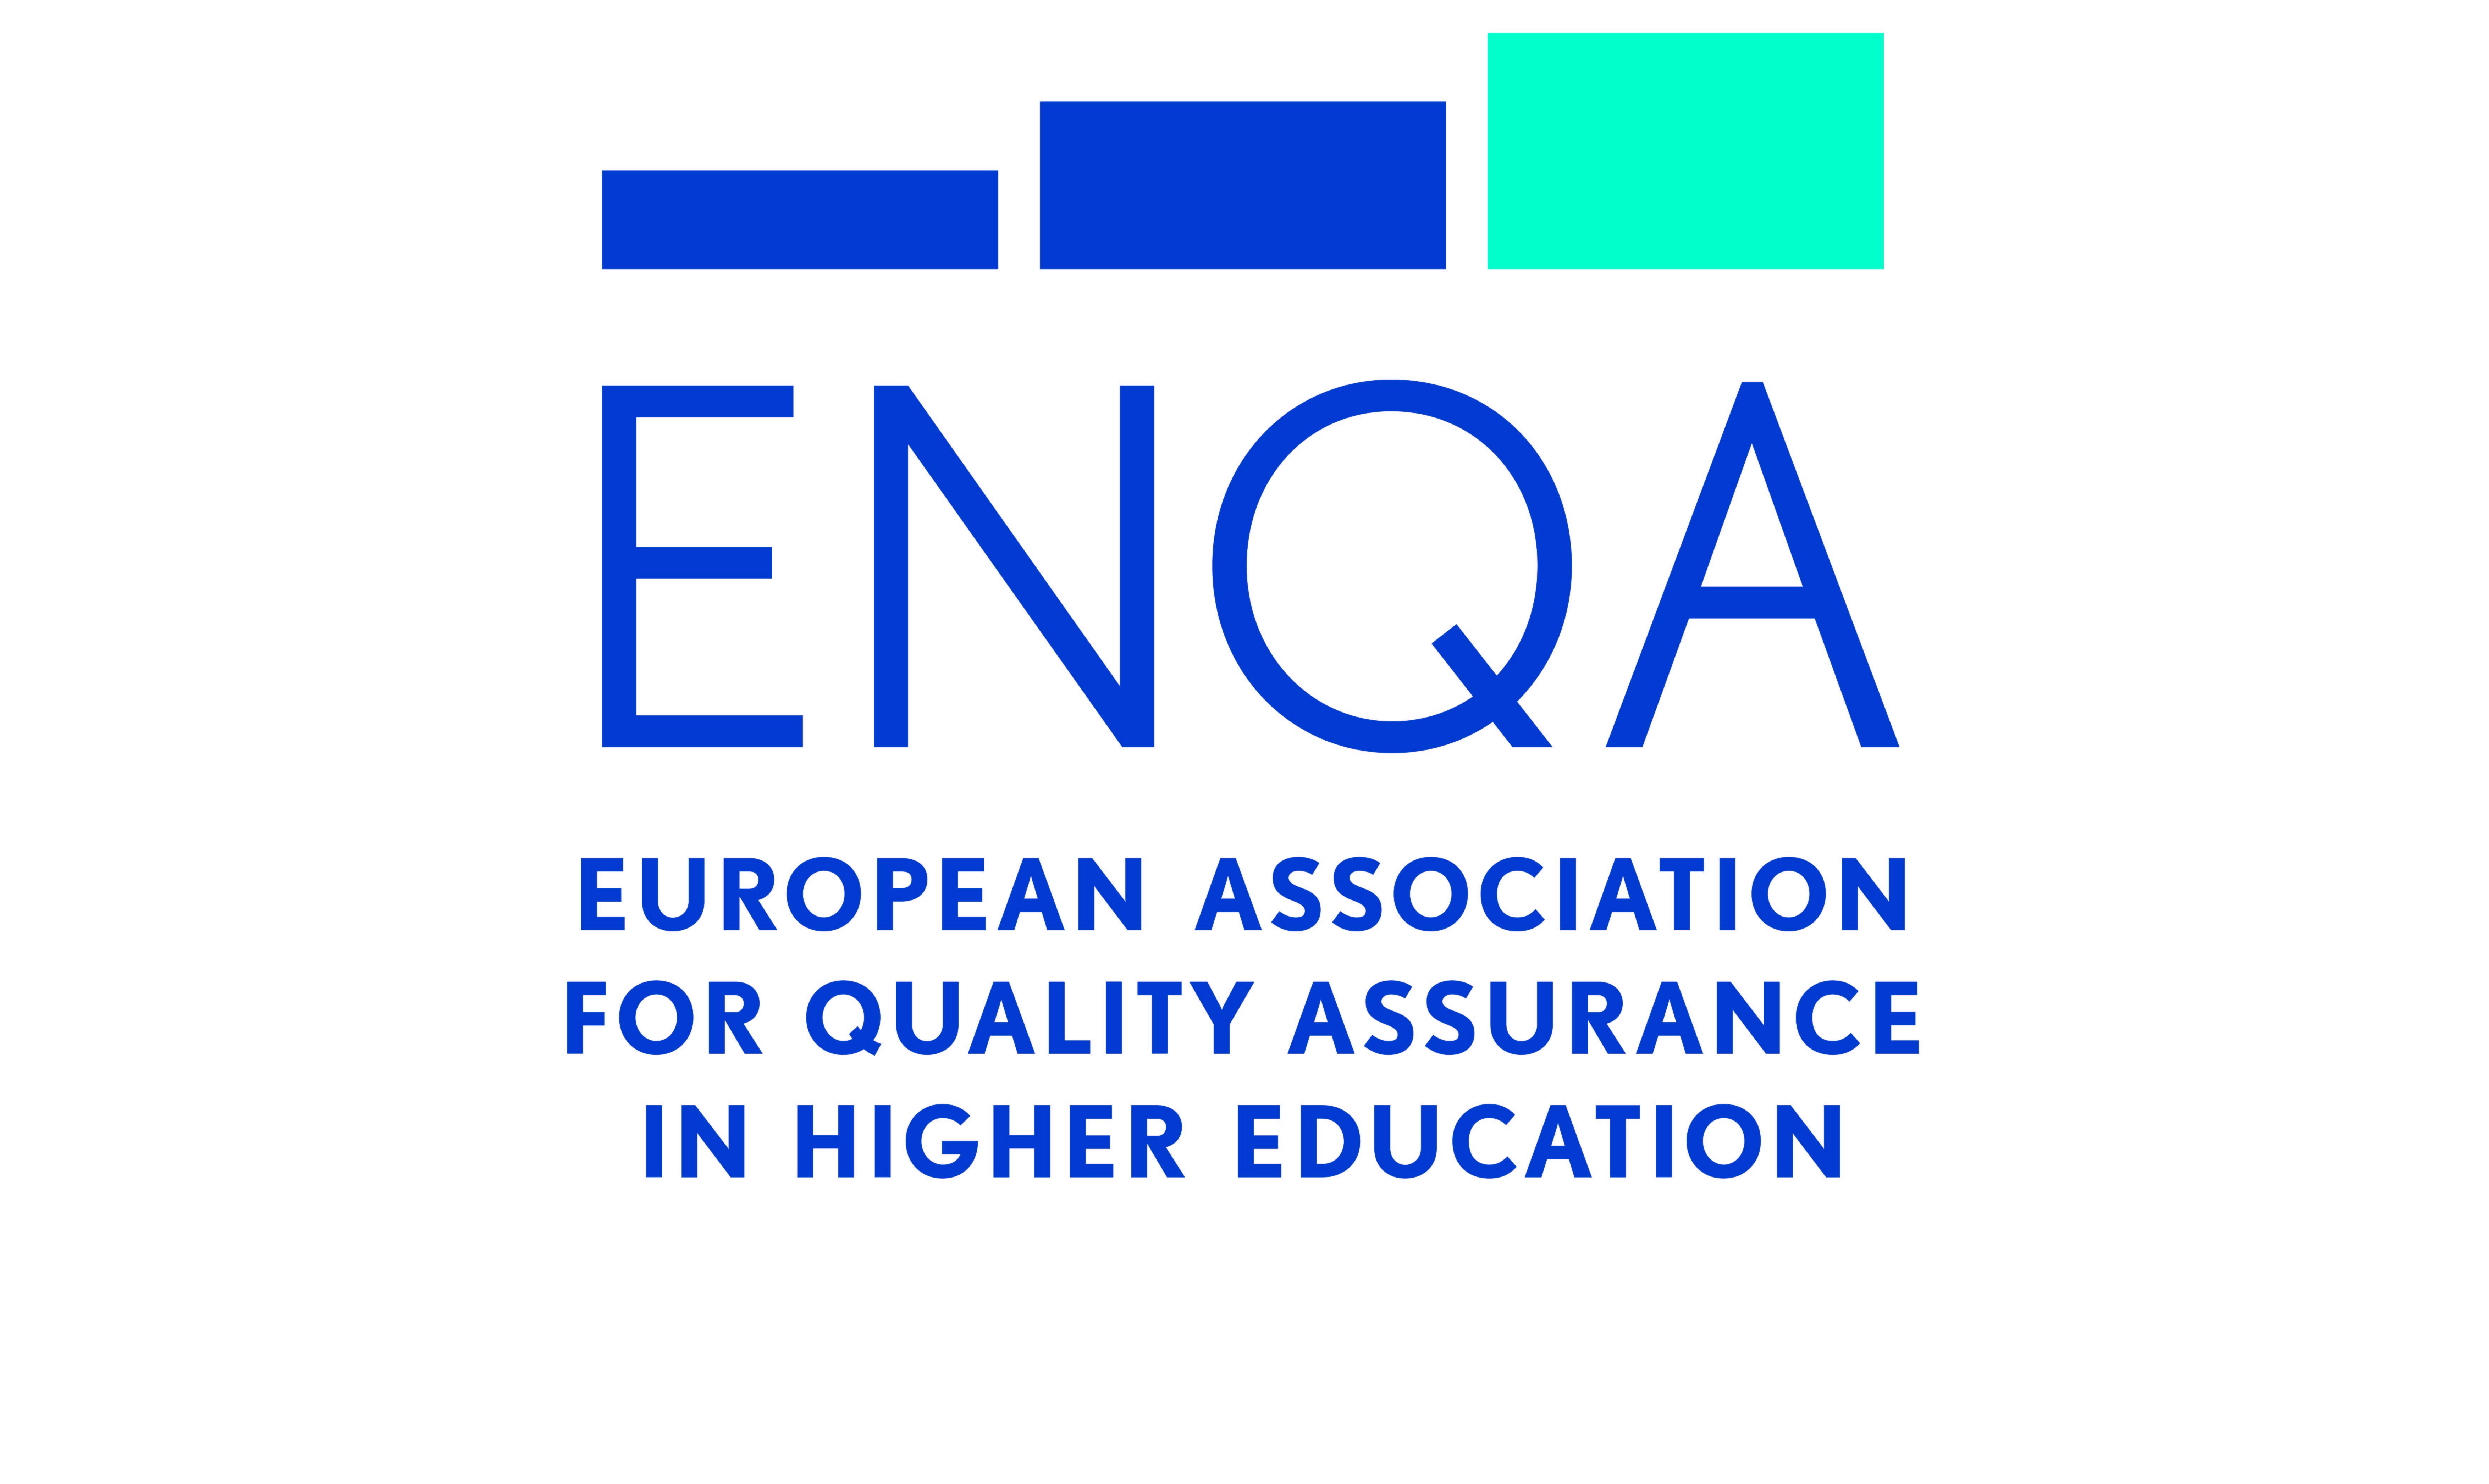 ENQA_logo-01